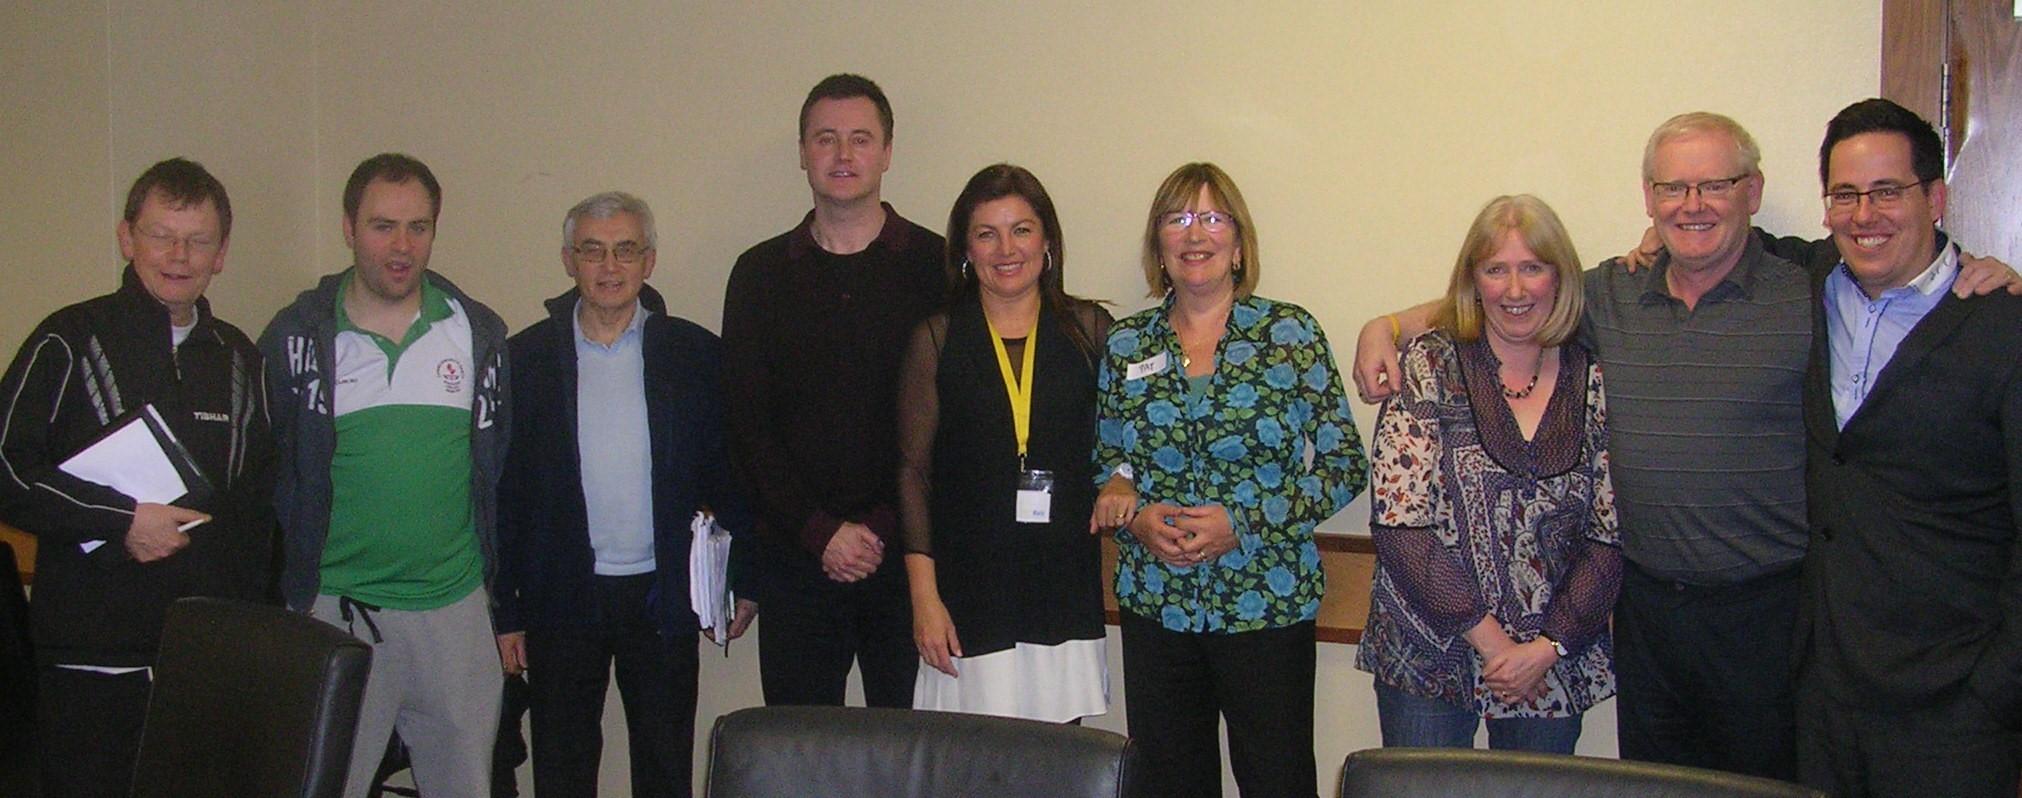 Group Facilitation Services Motivated Joyful